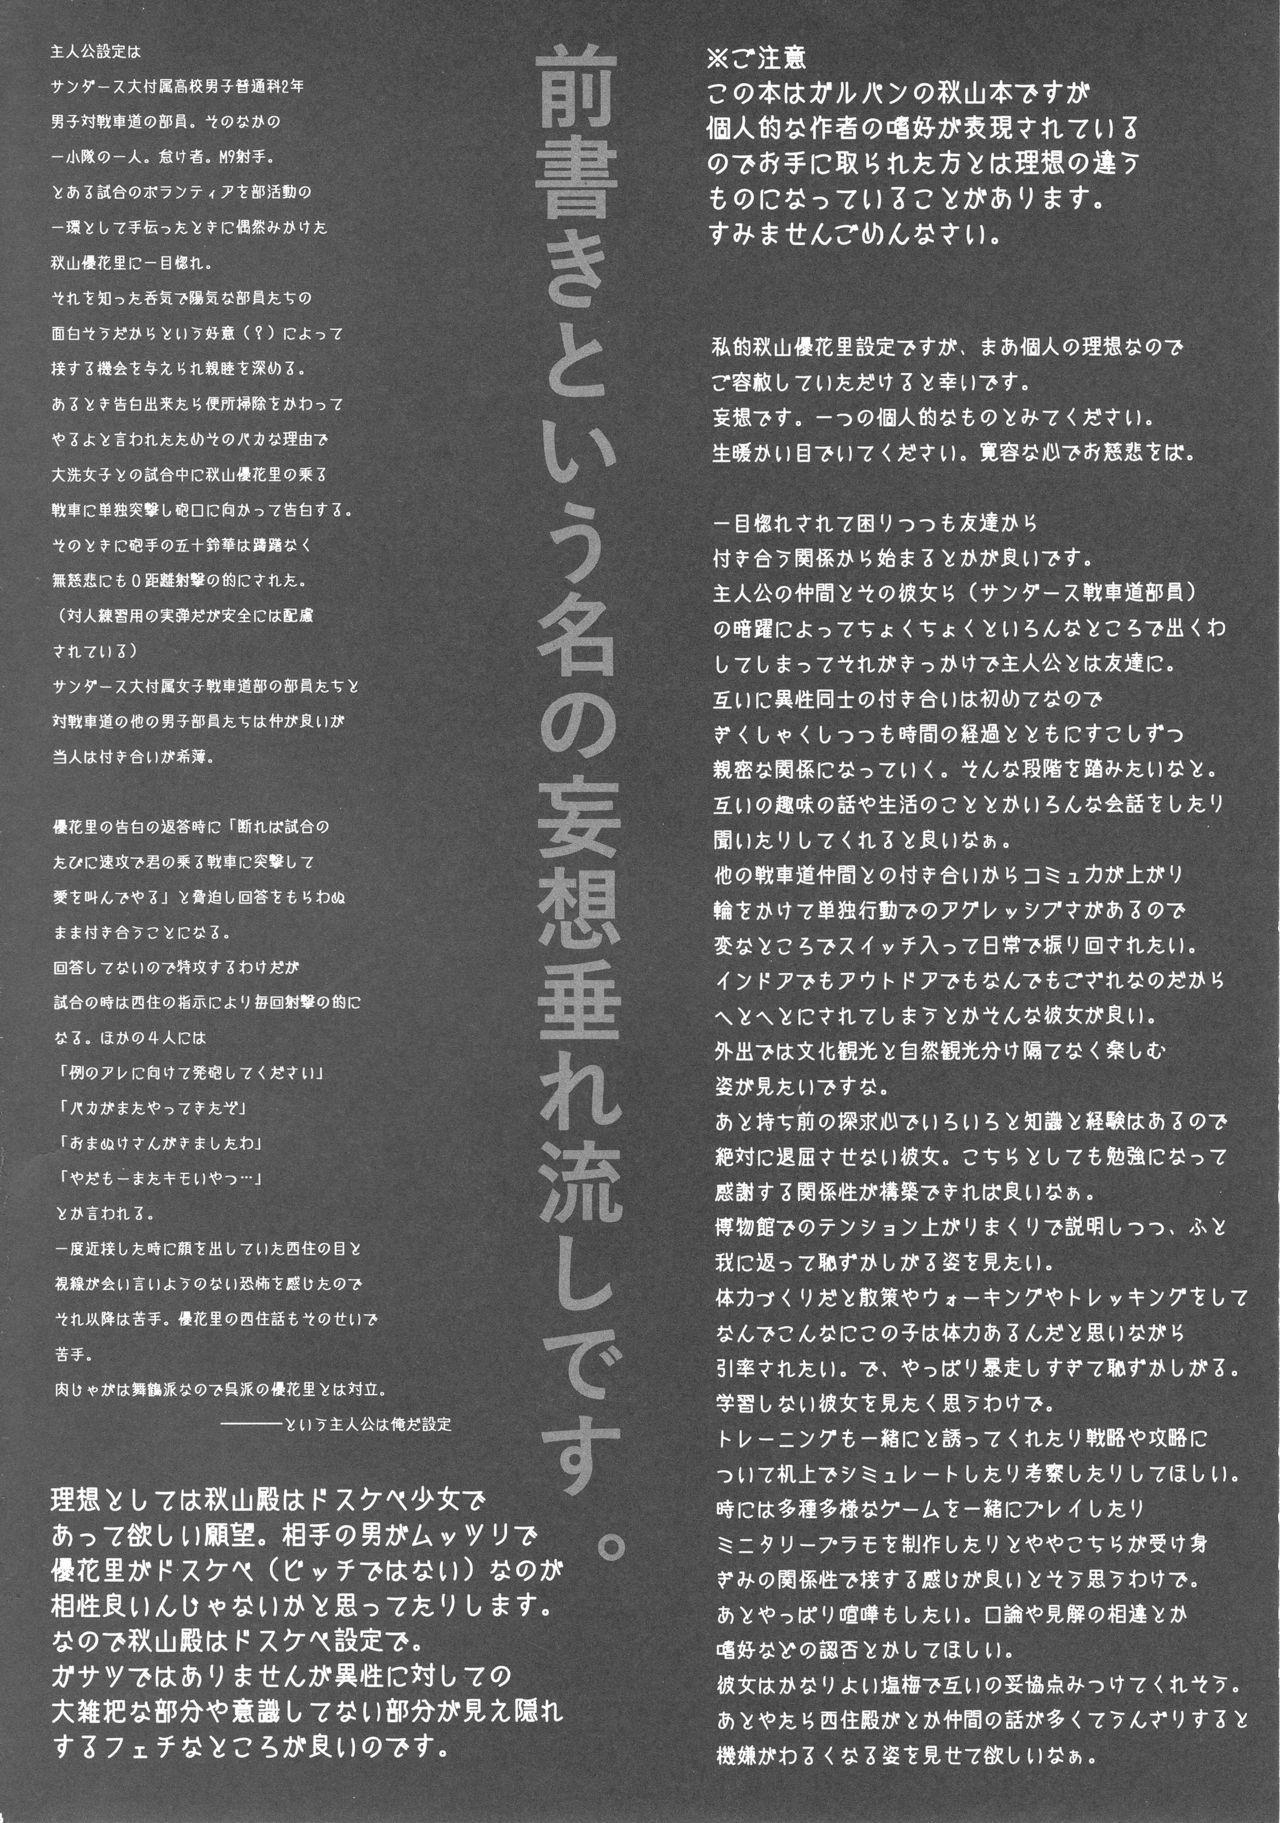 Akiyama-dono Mousou Nikki 2